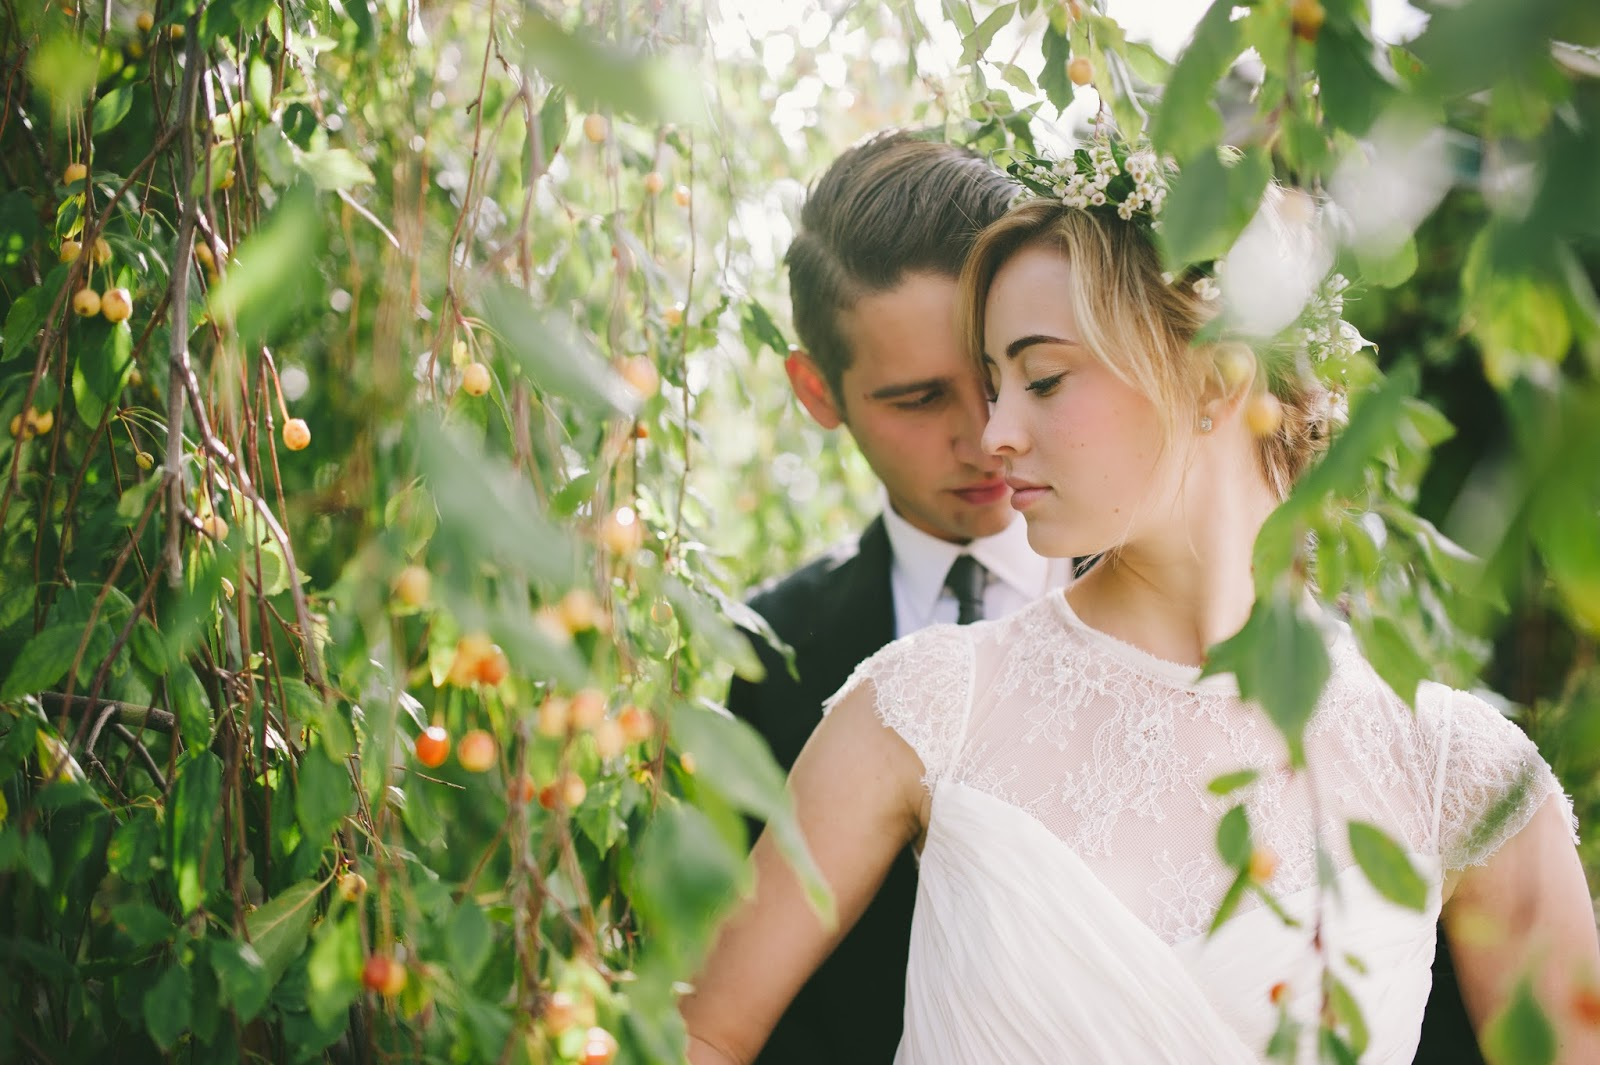 Nikon D810 For Wedding Photography: Jessie Alexis Photography: Taylor + Keaten Wedding Preview